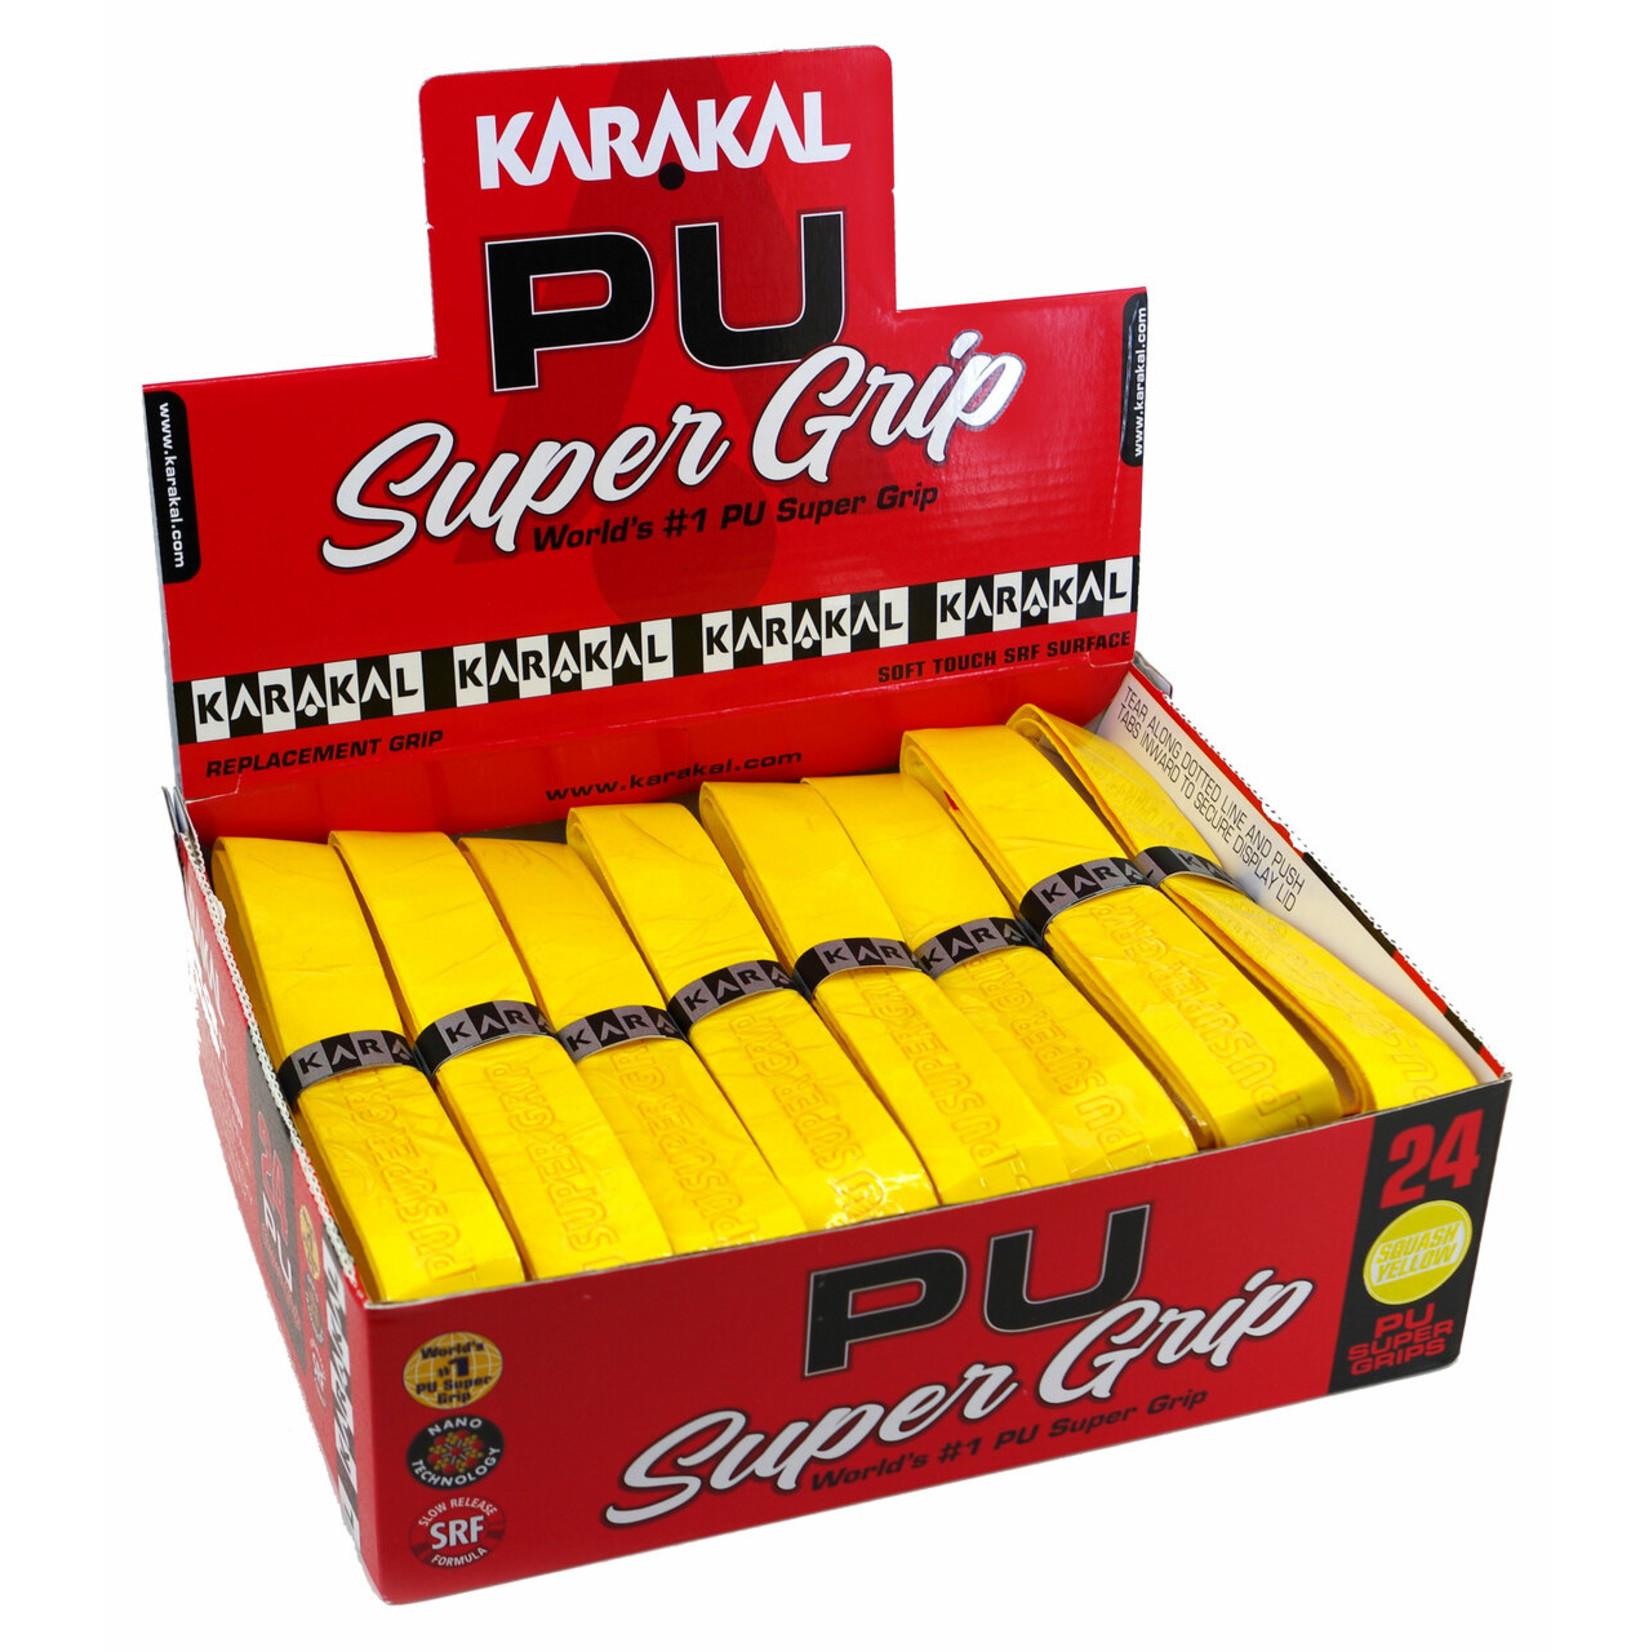 Karakal Super Grip